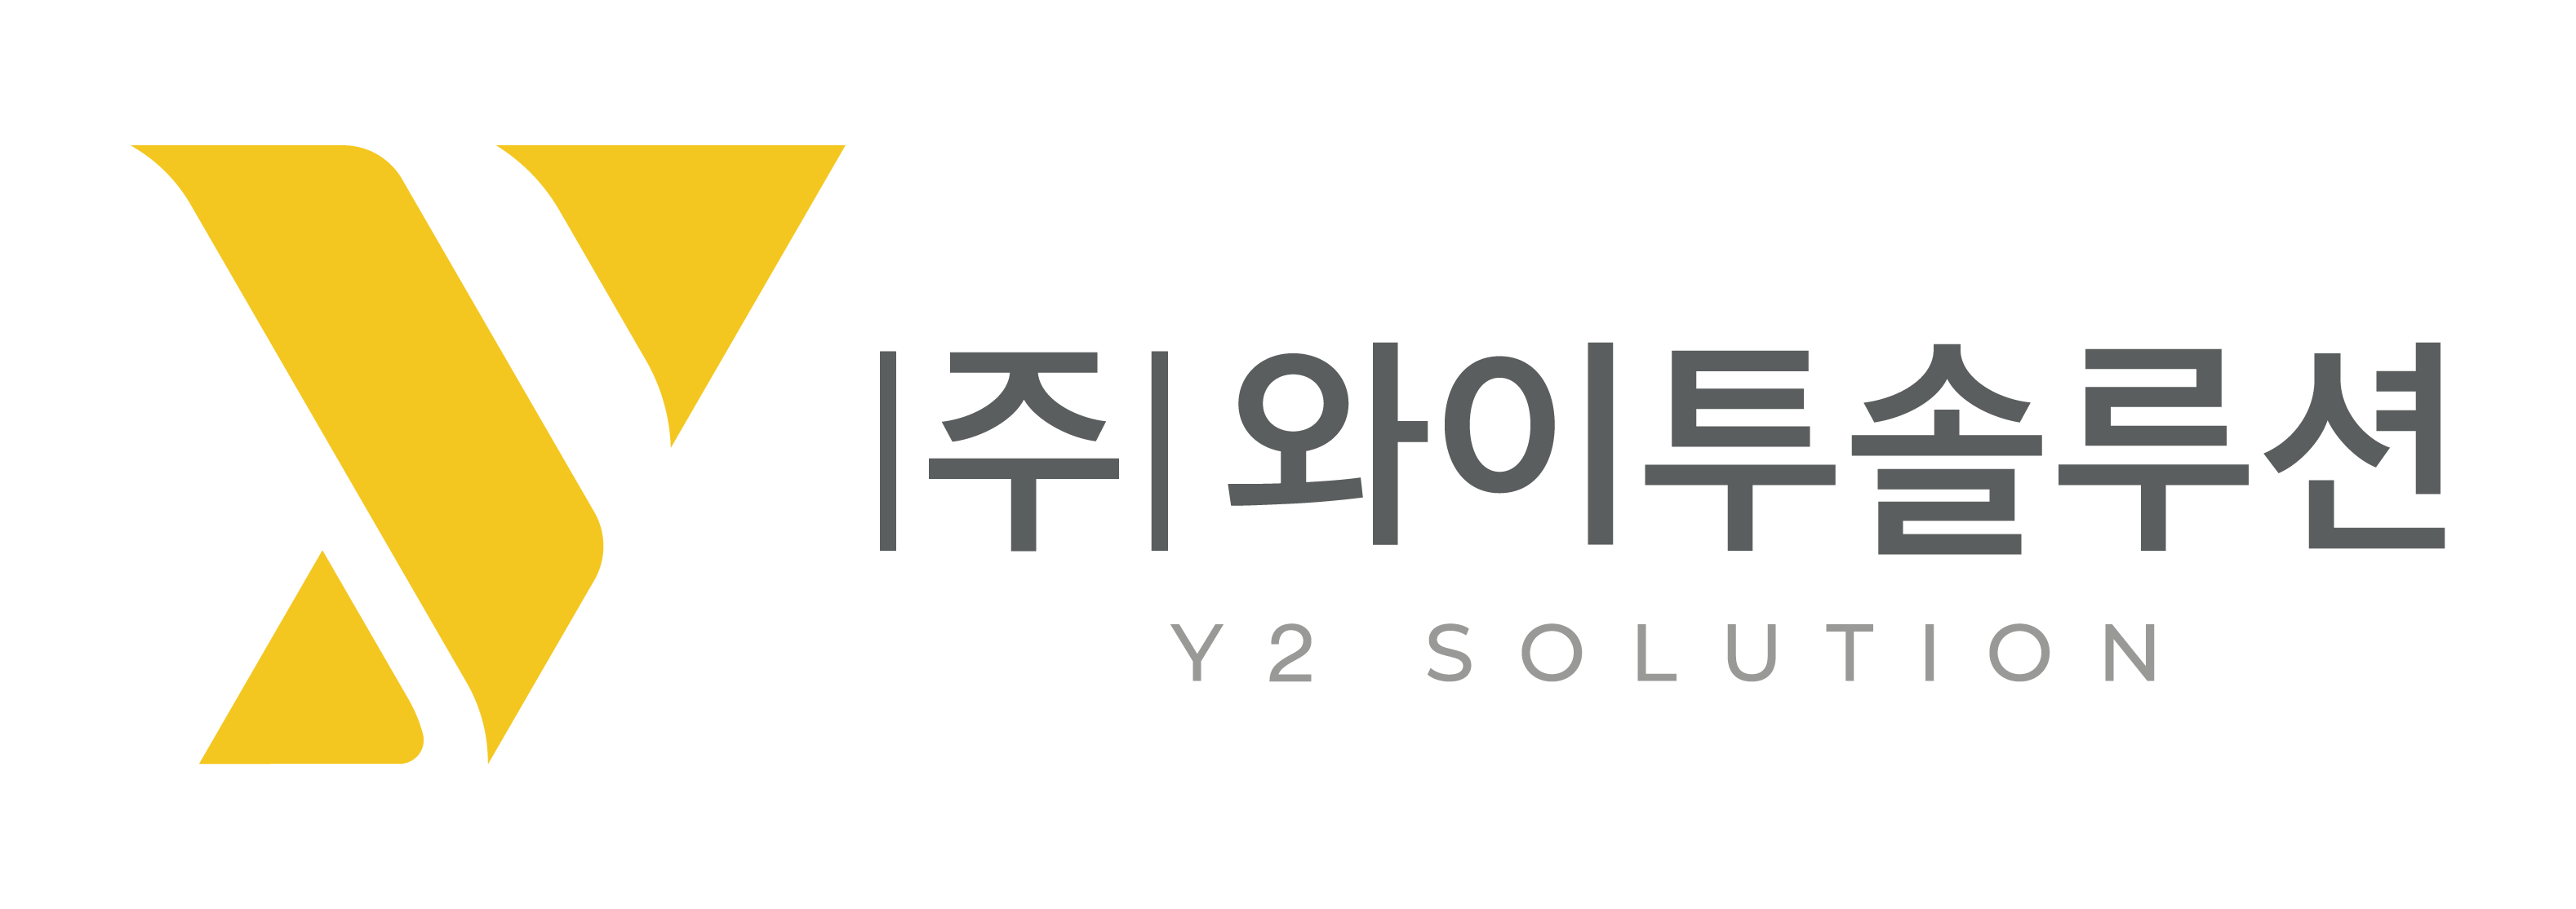 EV첨단소재의 계열사 (주)와이투솔루션의 로고